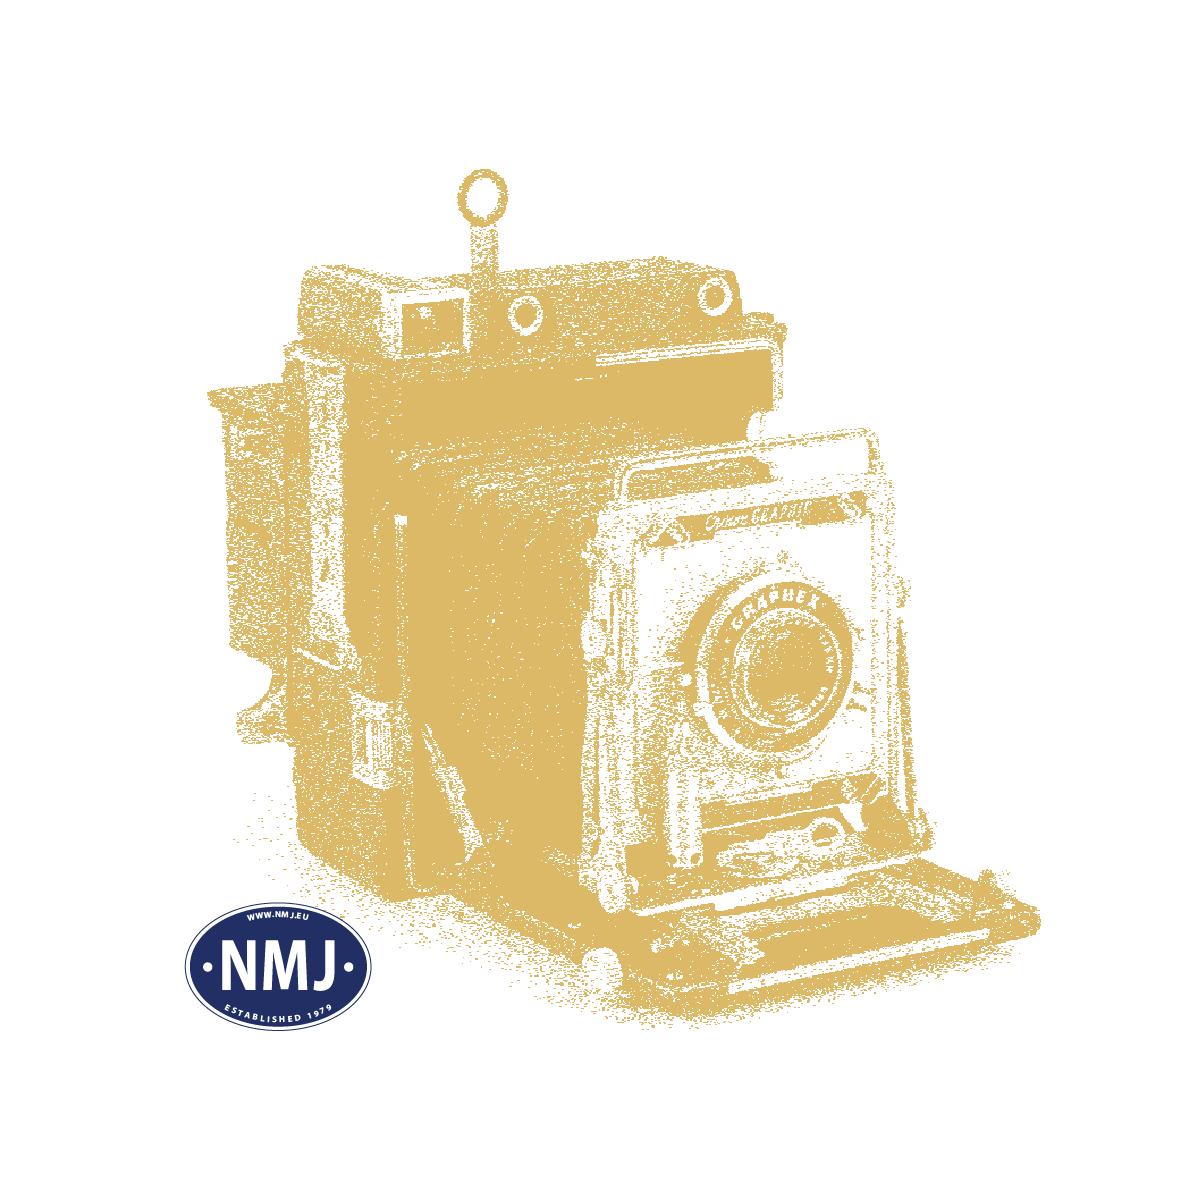 Topline Godsvogner, nmj-topline-507126-cargonet-lgns-42-77-443-2316-9-munkholm-H0, NMJT507.126